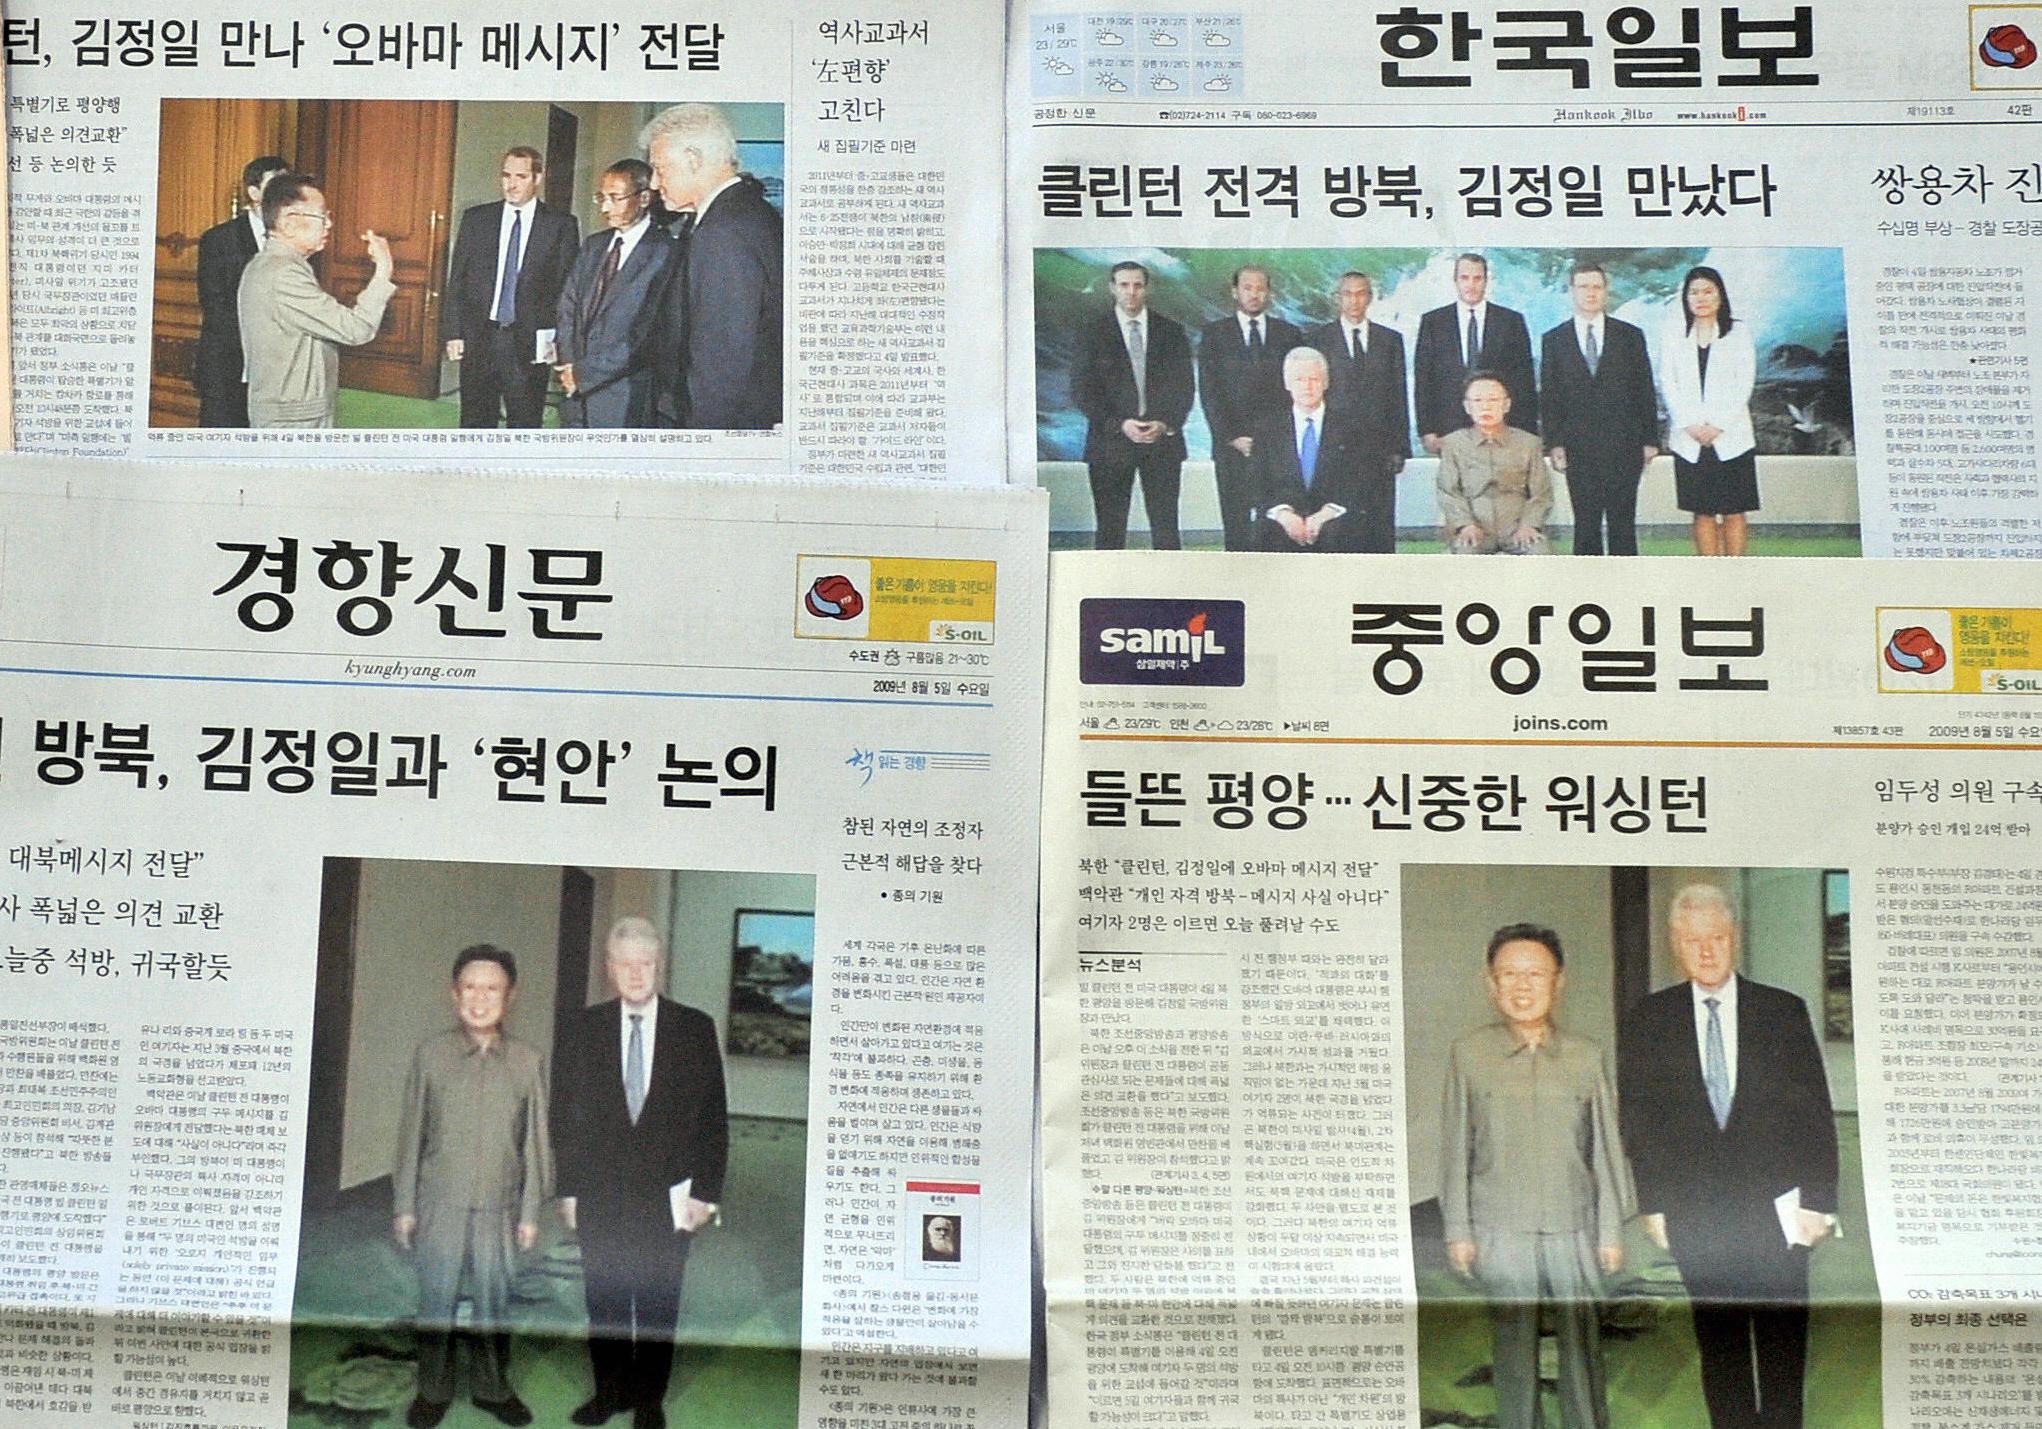 US president Bill Clinton's visit to North Korea meets Kim Jong-Il